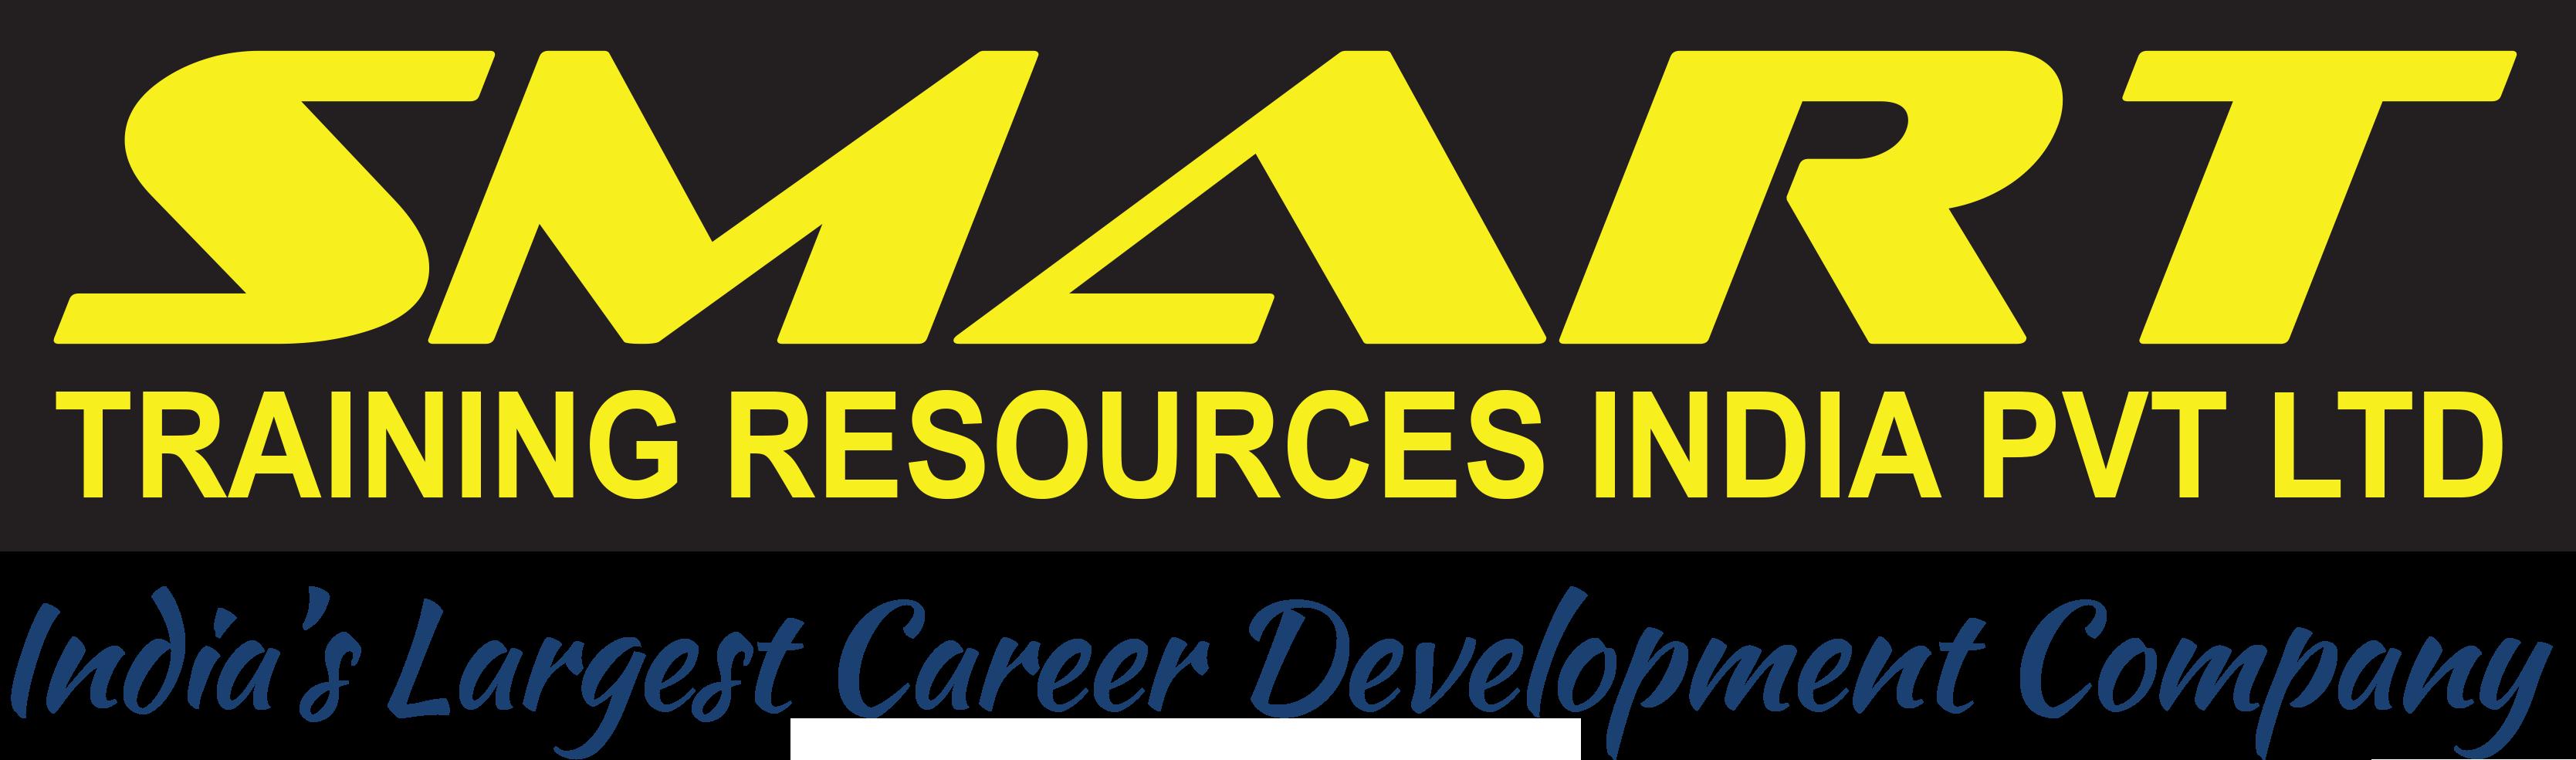 SMART Training Resources (I) Pvt Ltd